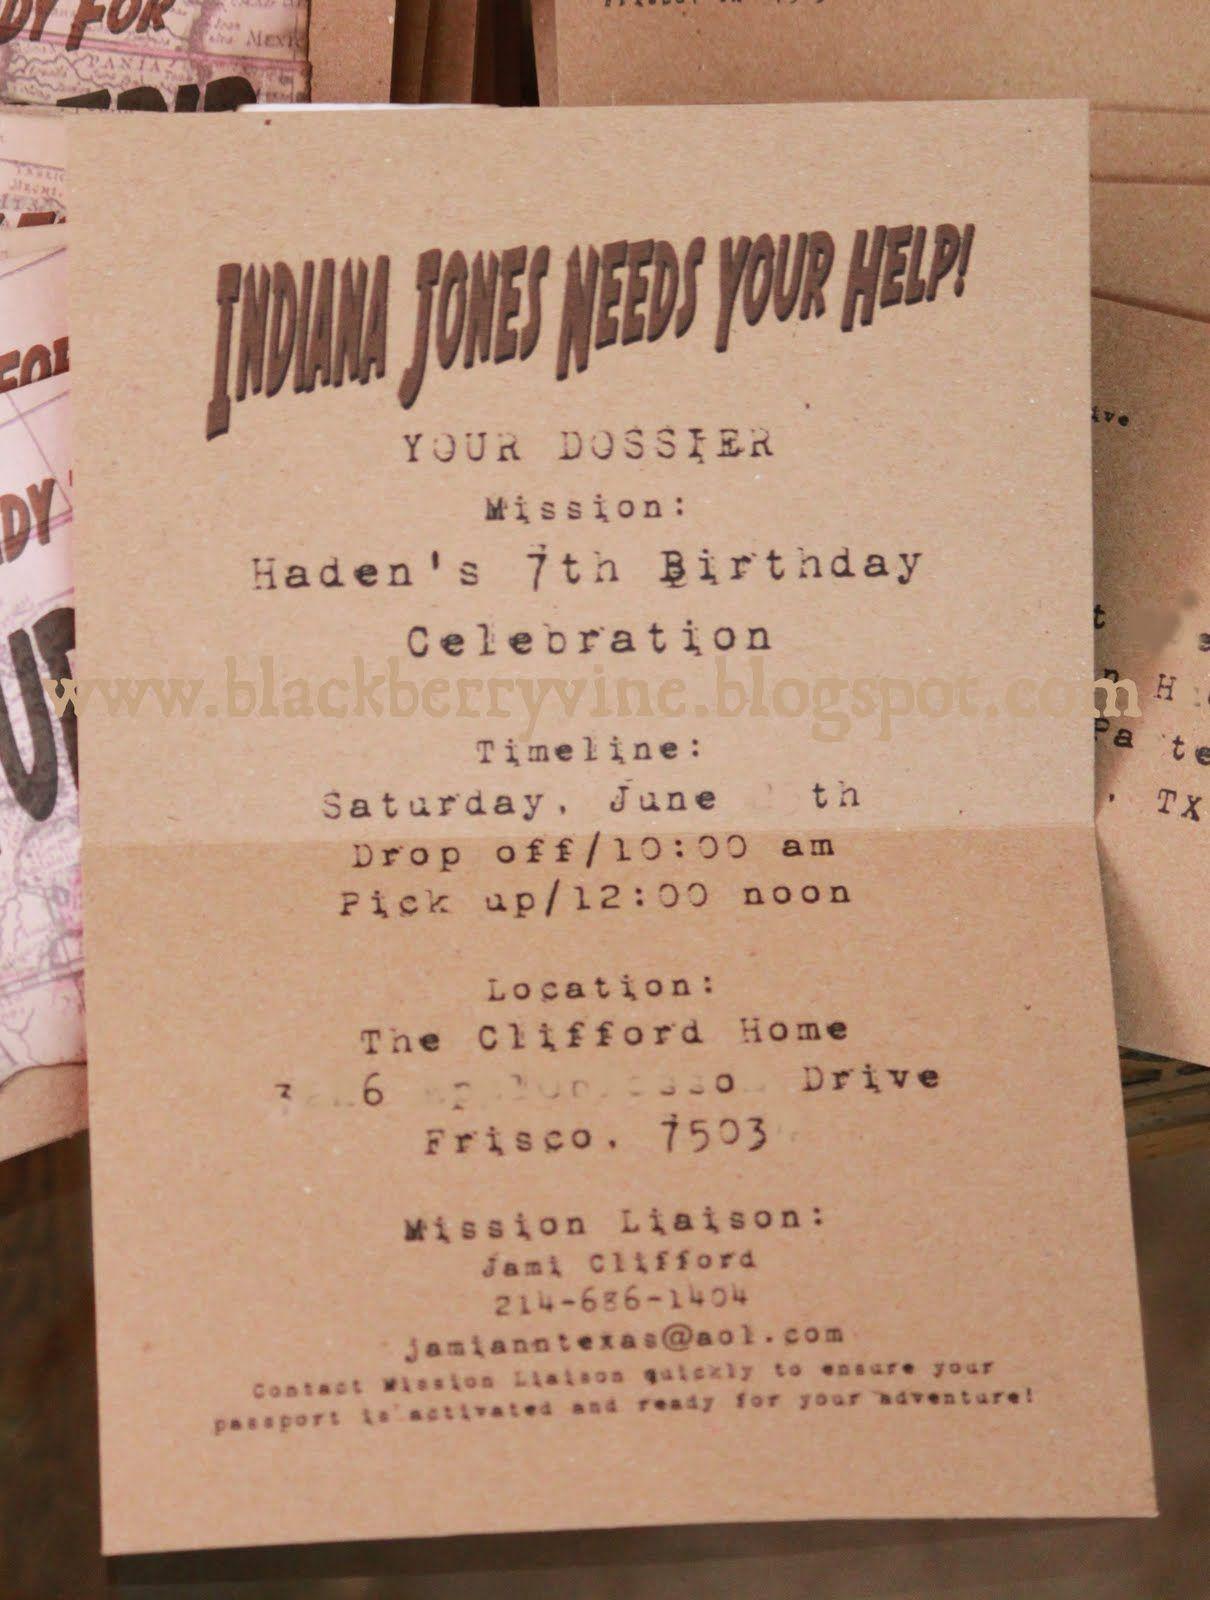 indianjones birthday party invitations printable%0A Indiana Jones Treasure Hunt Ideas  Great for an Indiana Jones theme party     Indiana Jones   Pinterest   Indiana jones  Indiana jones party and Indiana